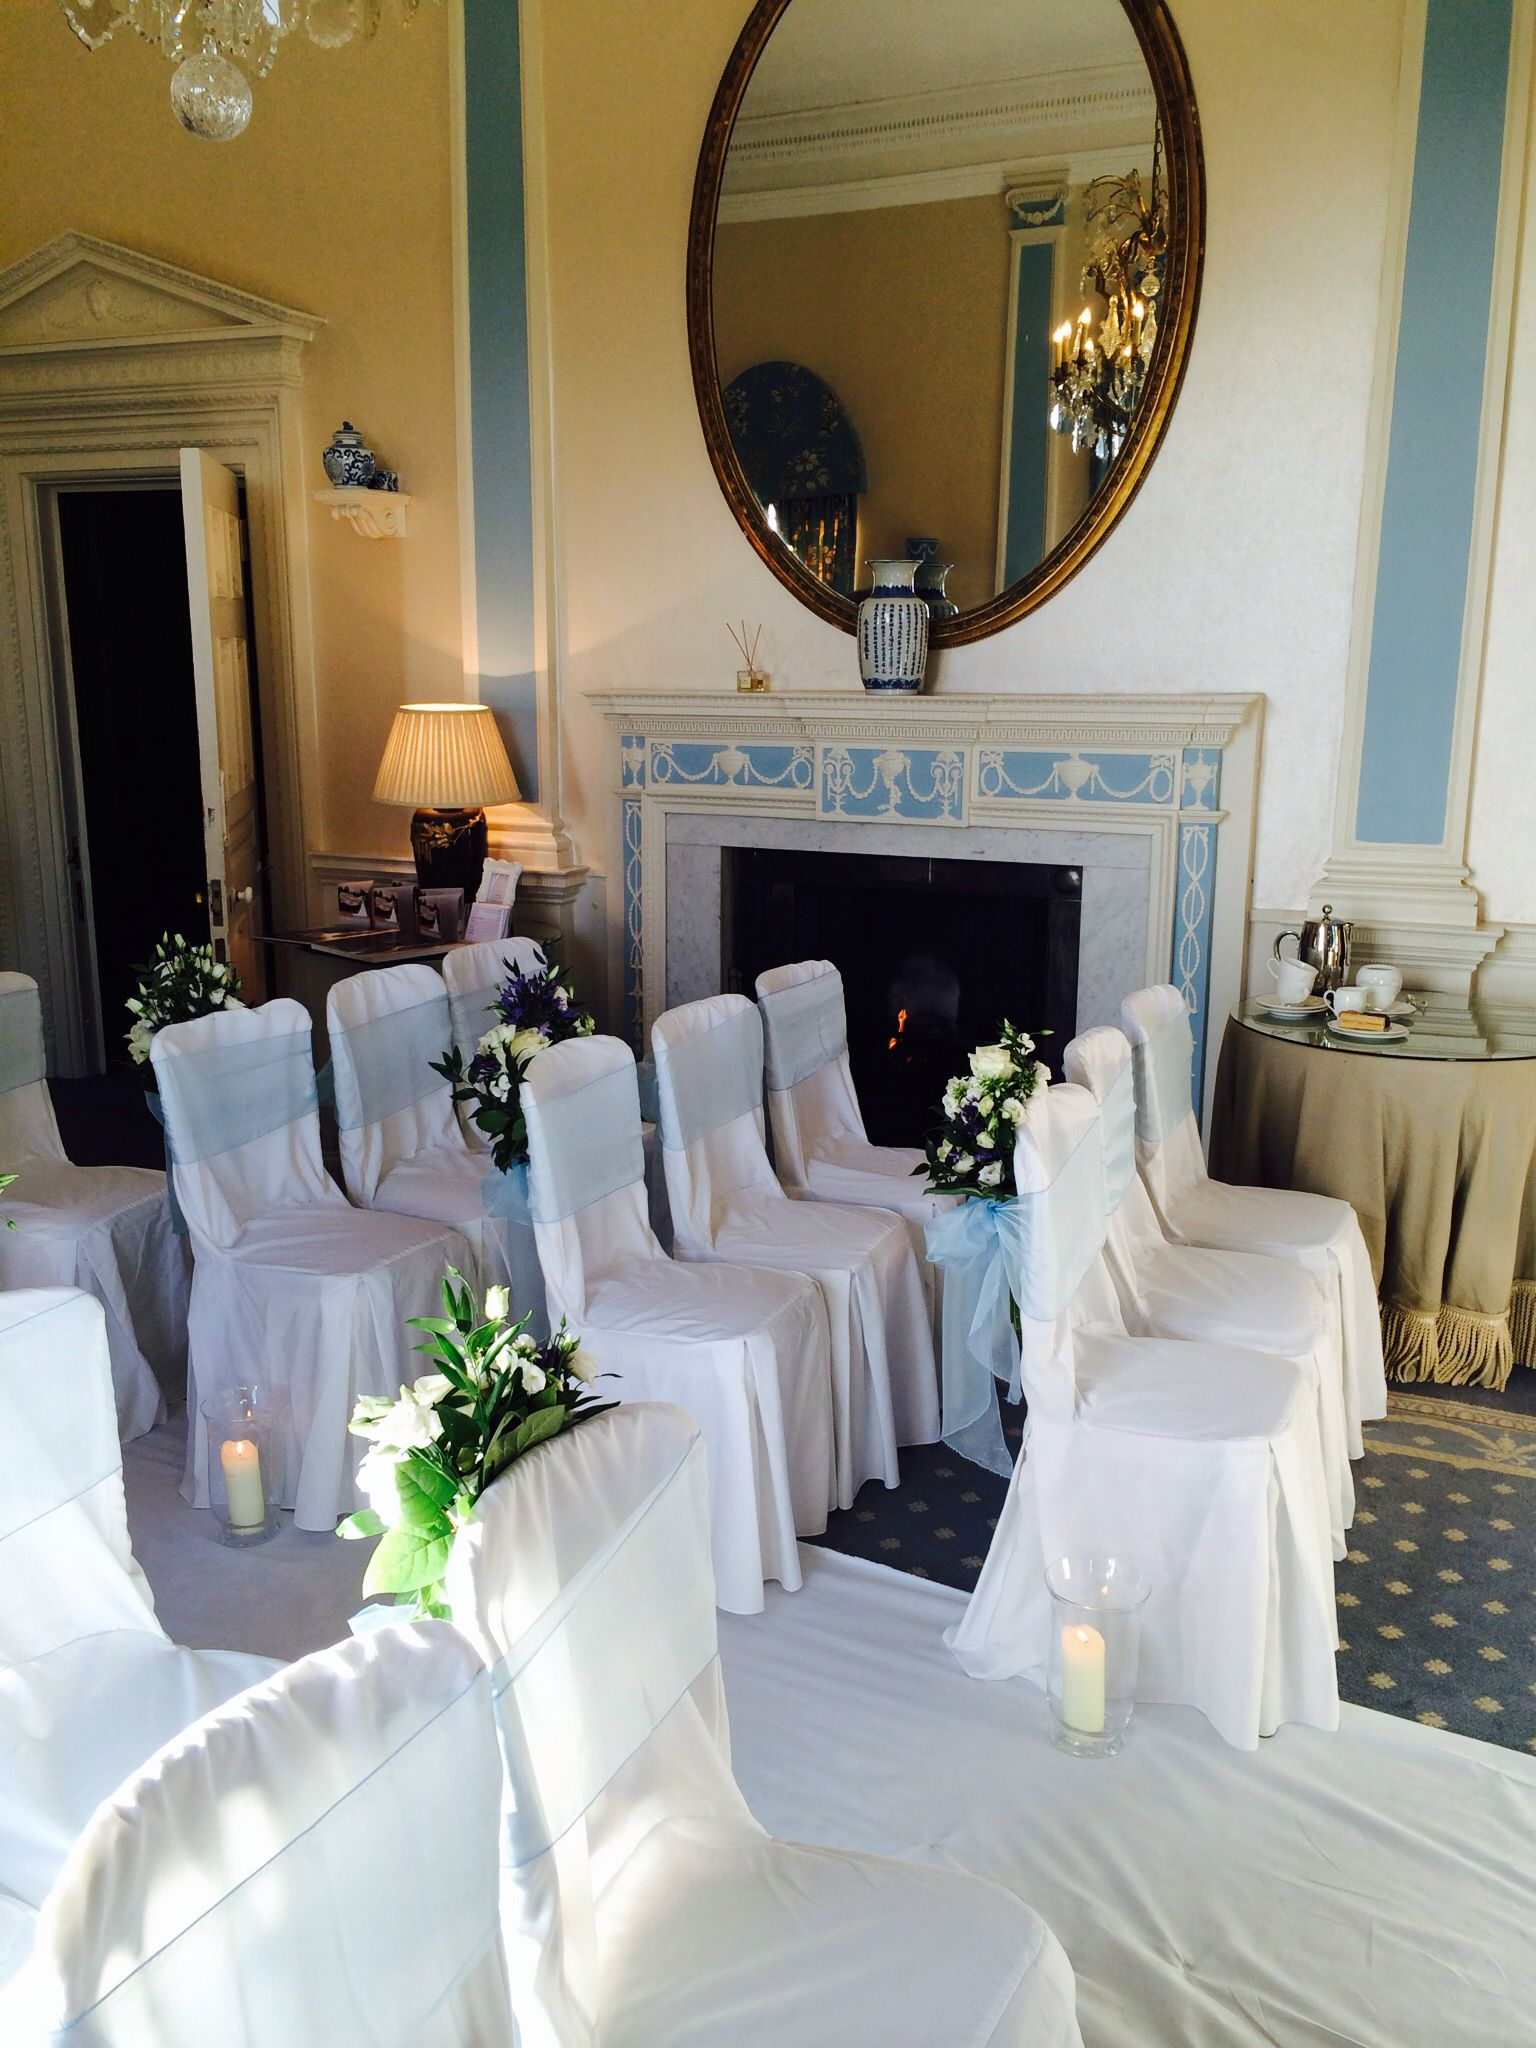 The ceremony room - the boudoir